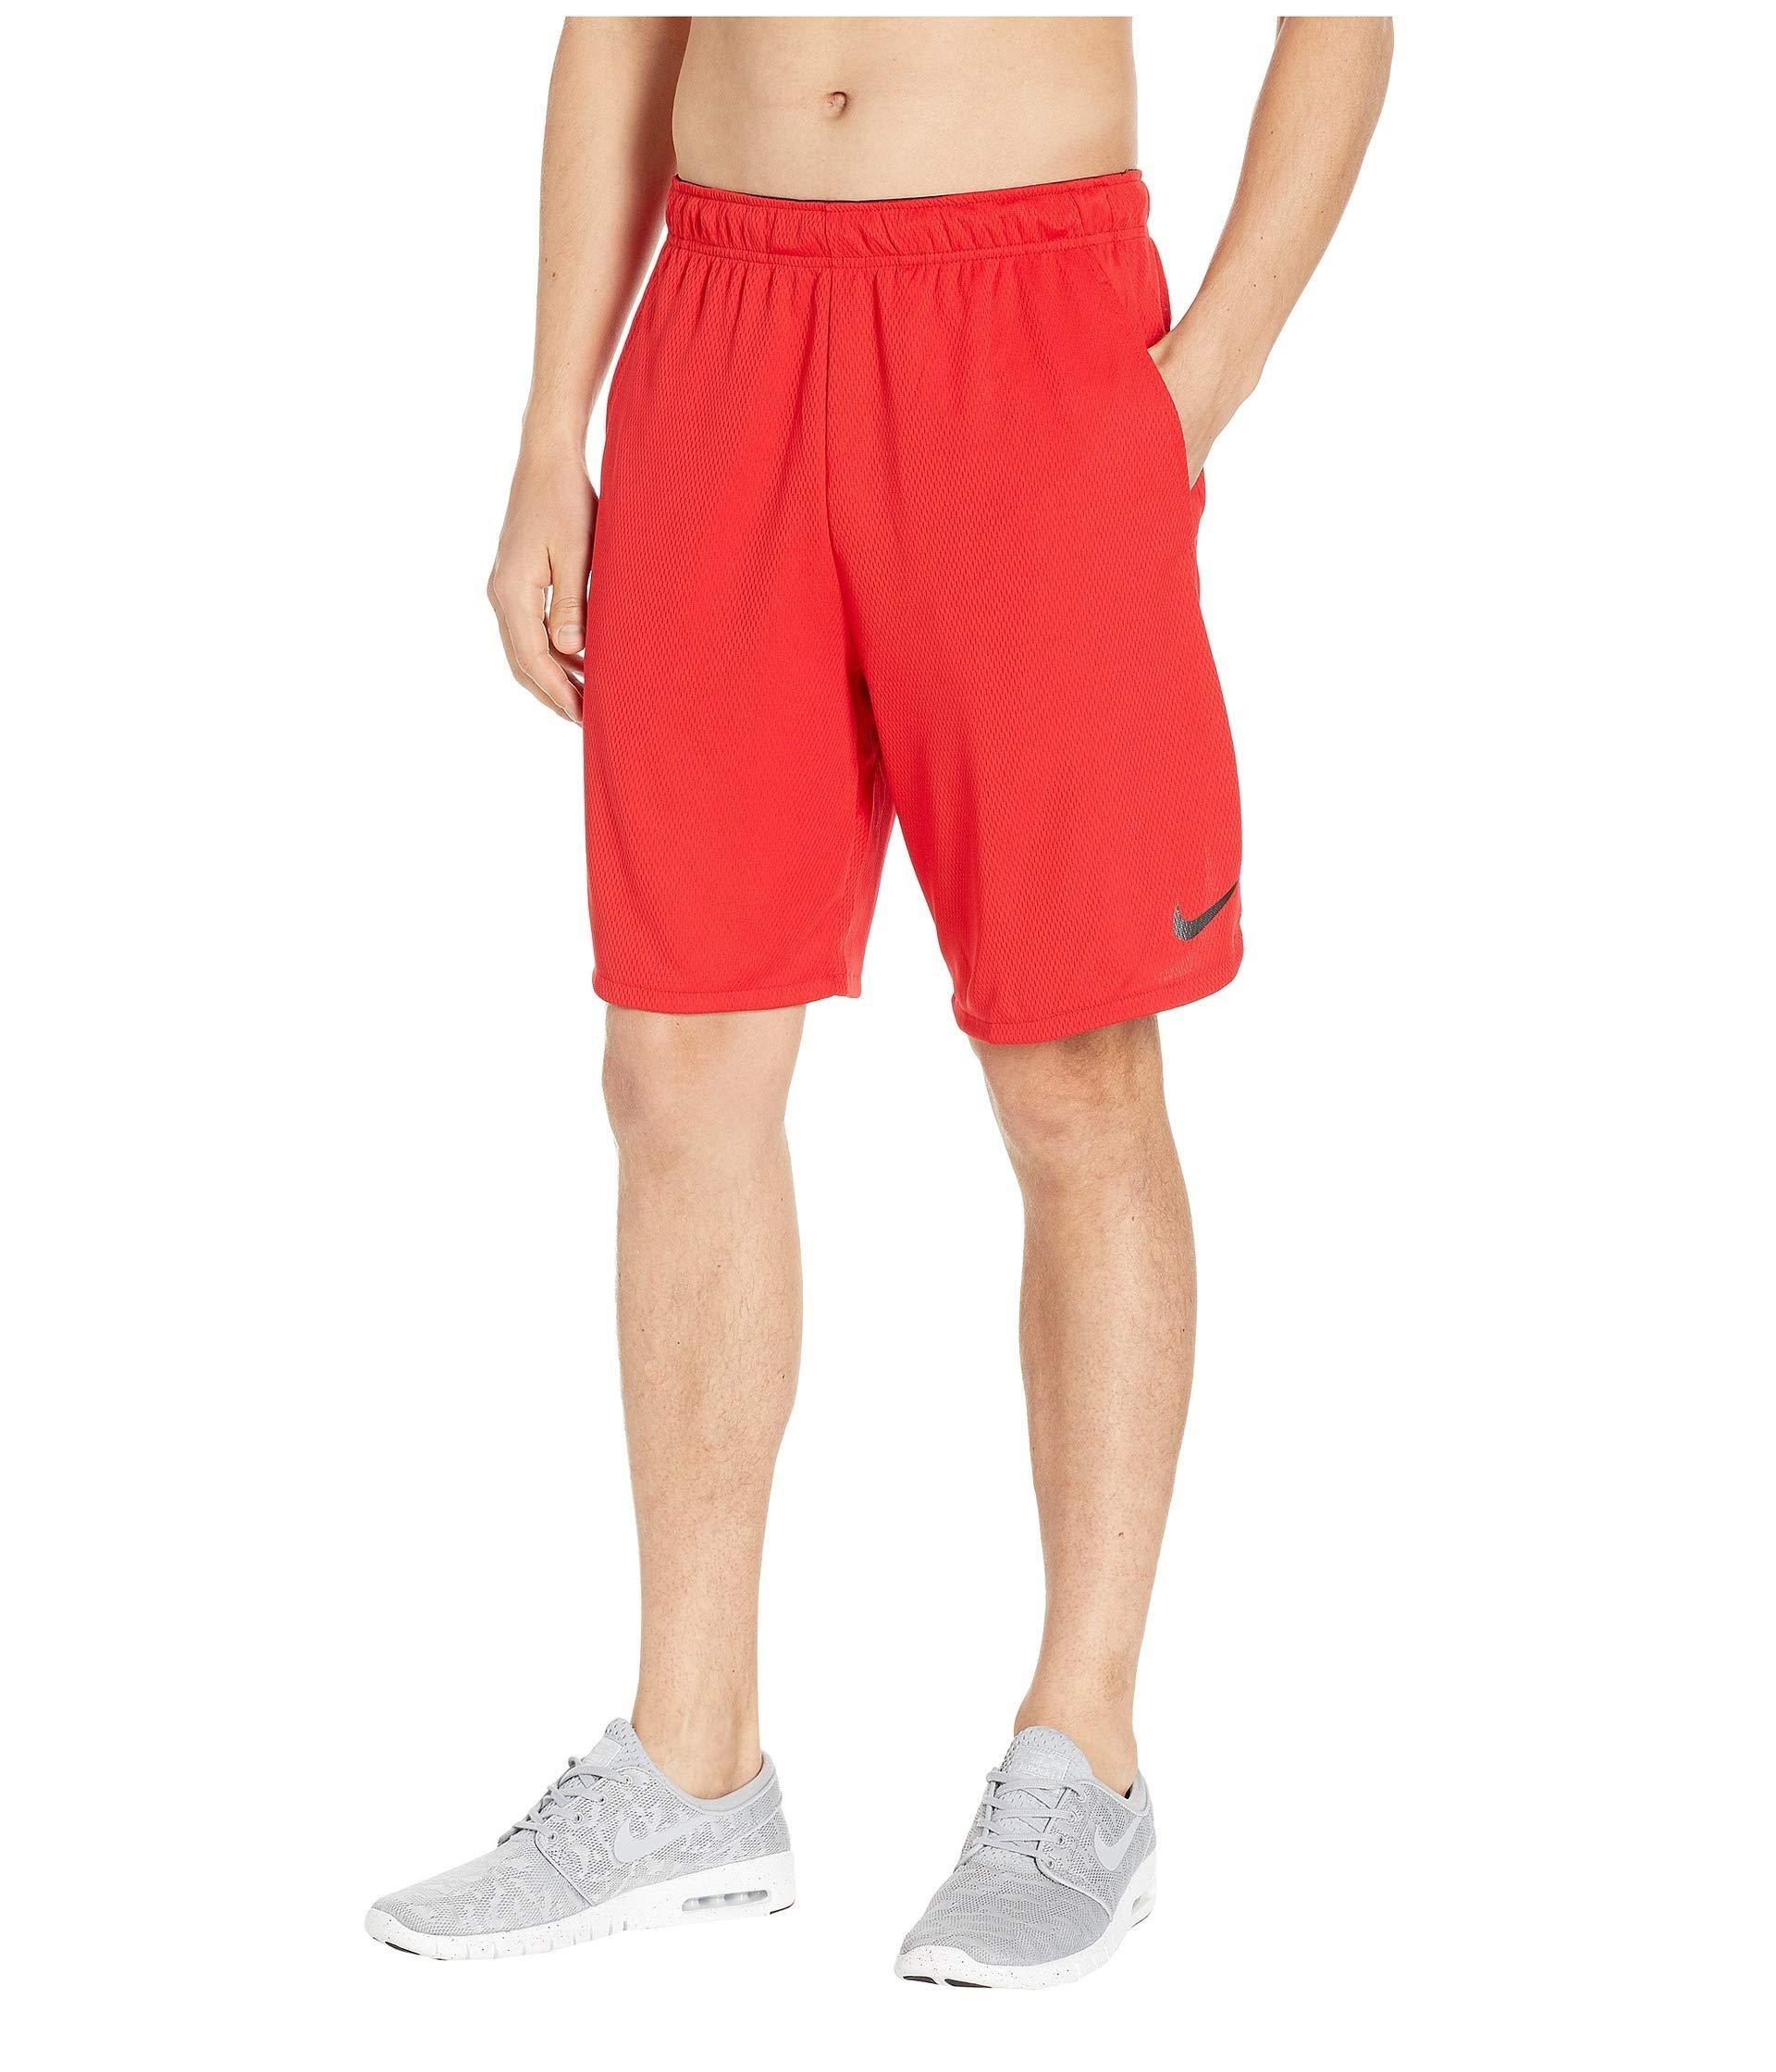 a8376ee752c Lyst - Nike Dri-fit 9 Training Short (black dark Grey) Men s Shorts ...